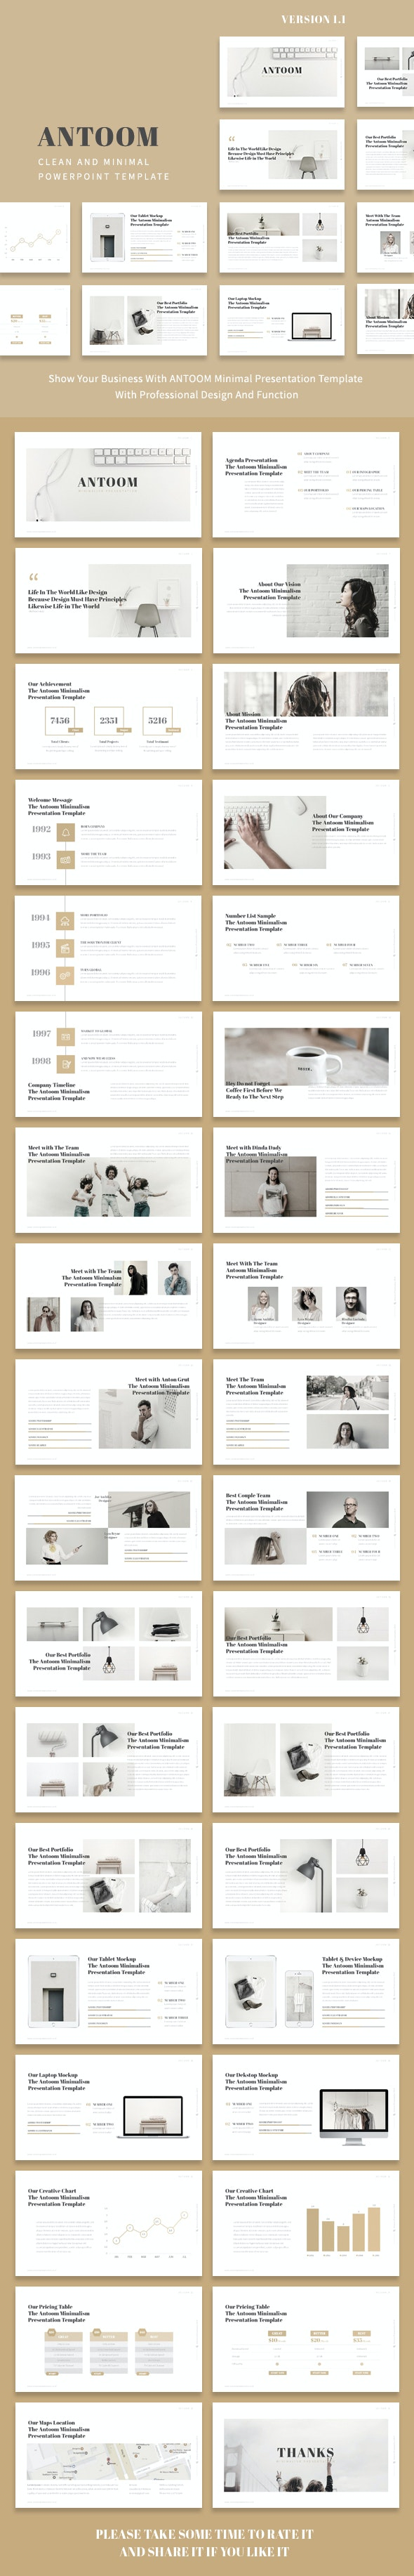 Antoom - Minimal Powerpoint Presentation Template - Creative PowerPoint Templates